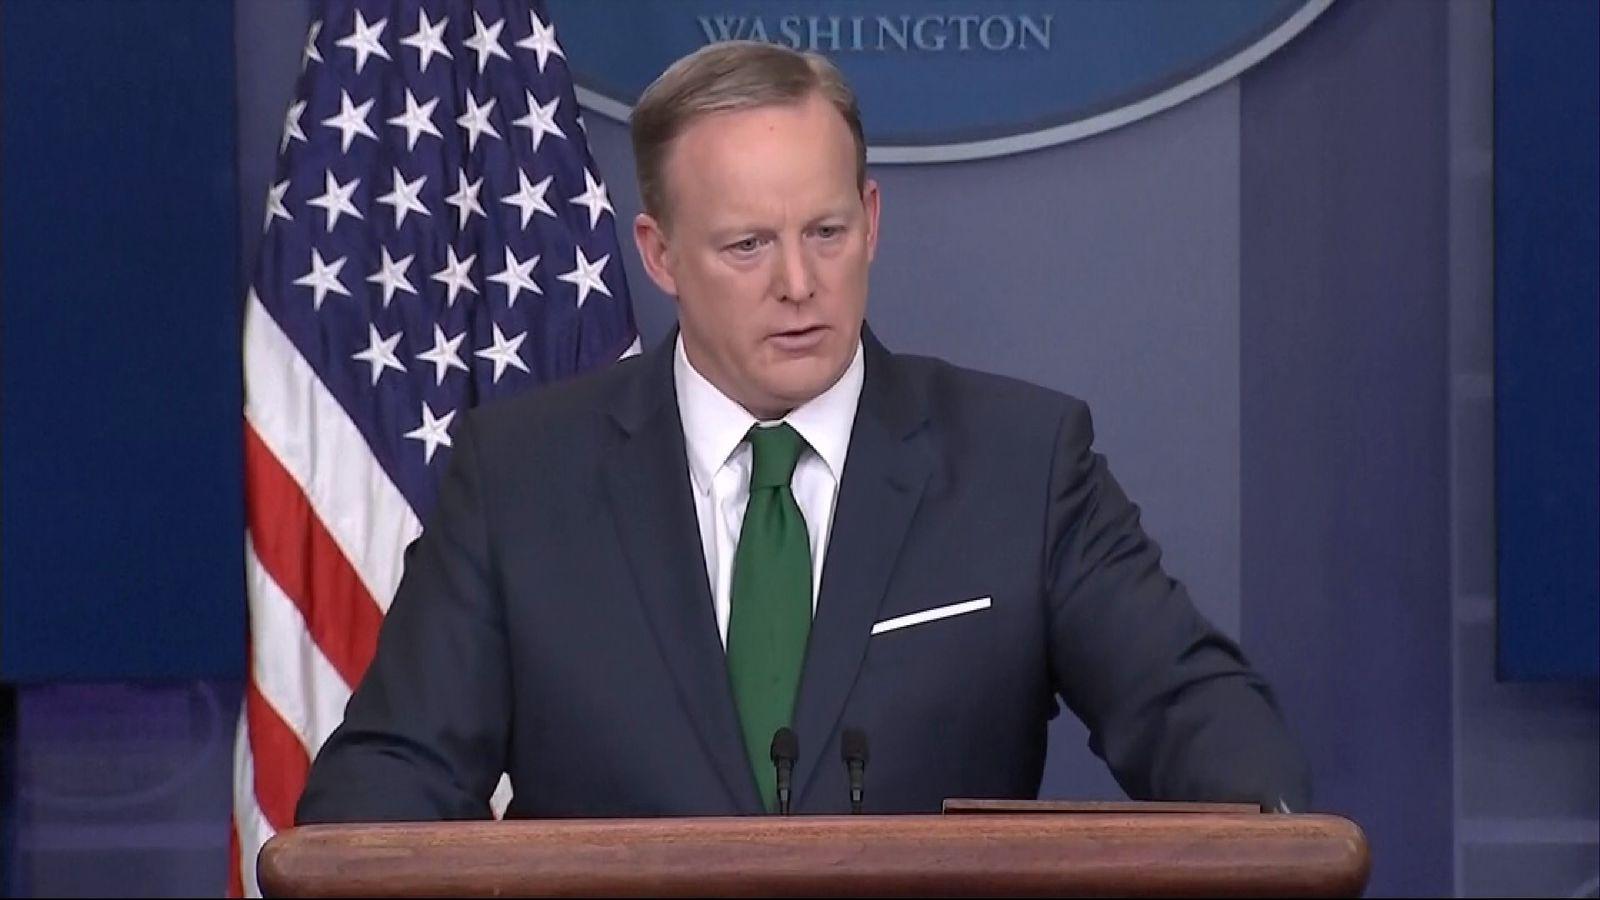 Sean Spicer repeats claims that GCHQ bugged Trump Tower